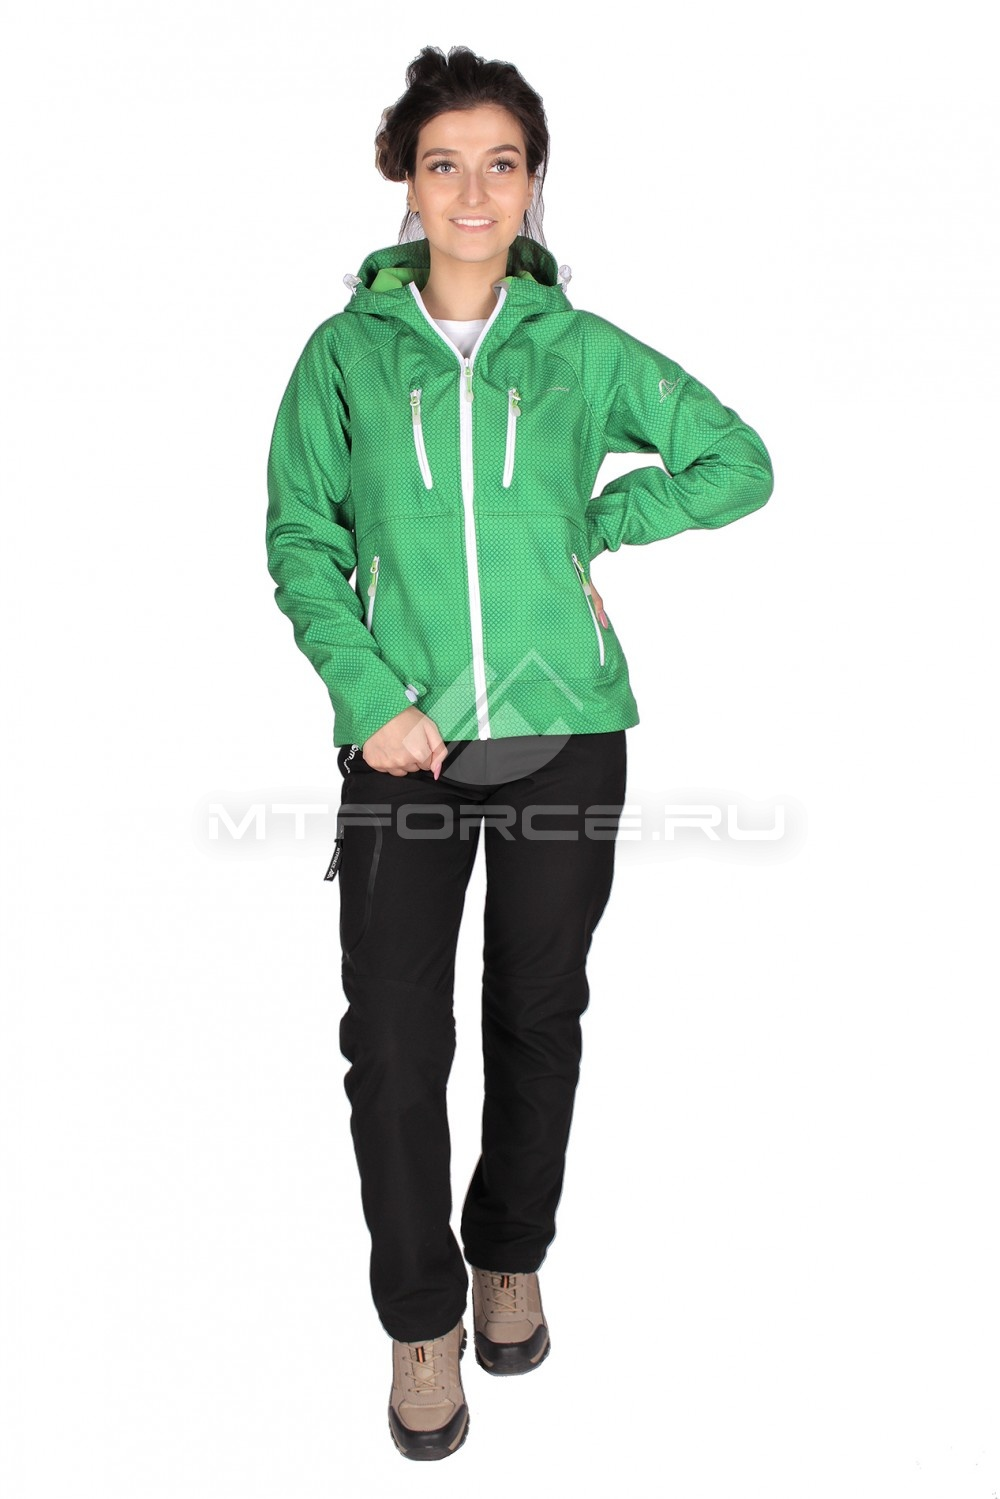 Купить  оптом Костюм виндстопер женский зеленого цвета 01736Z